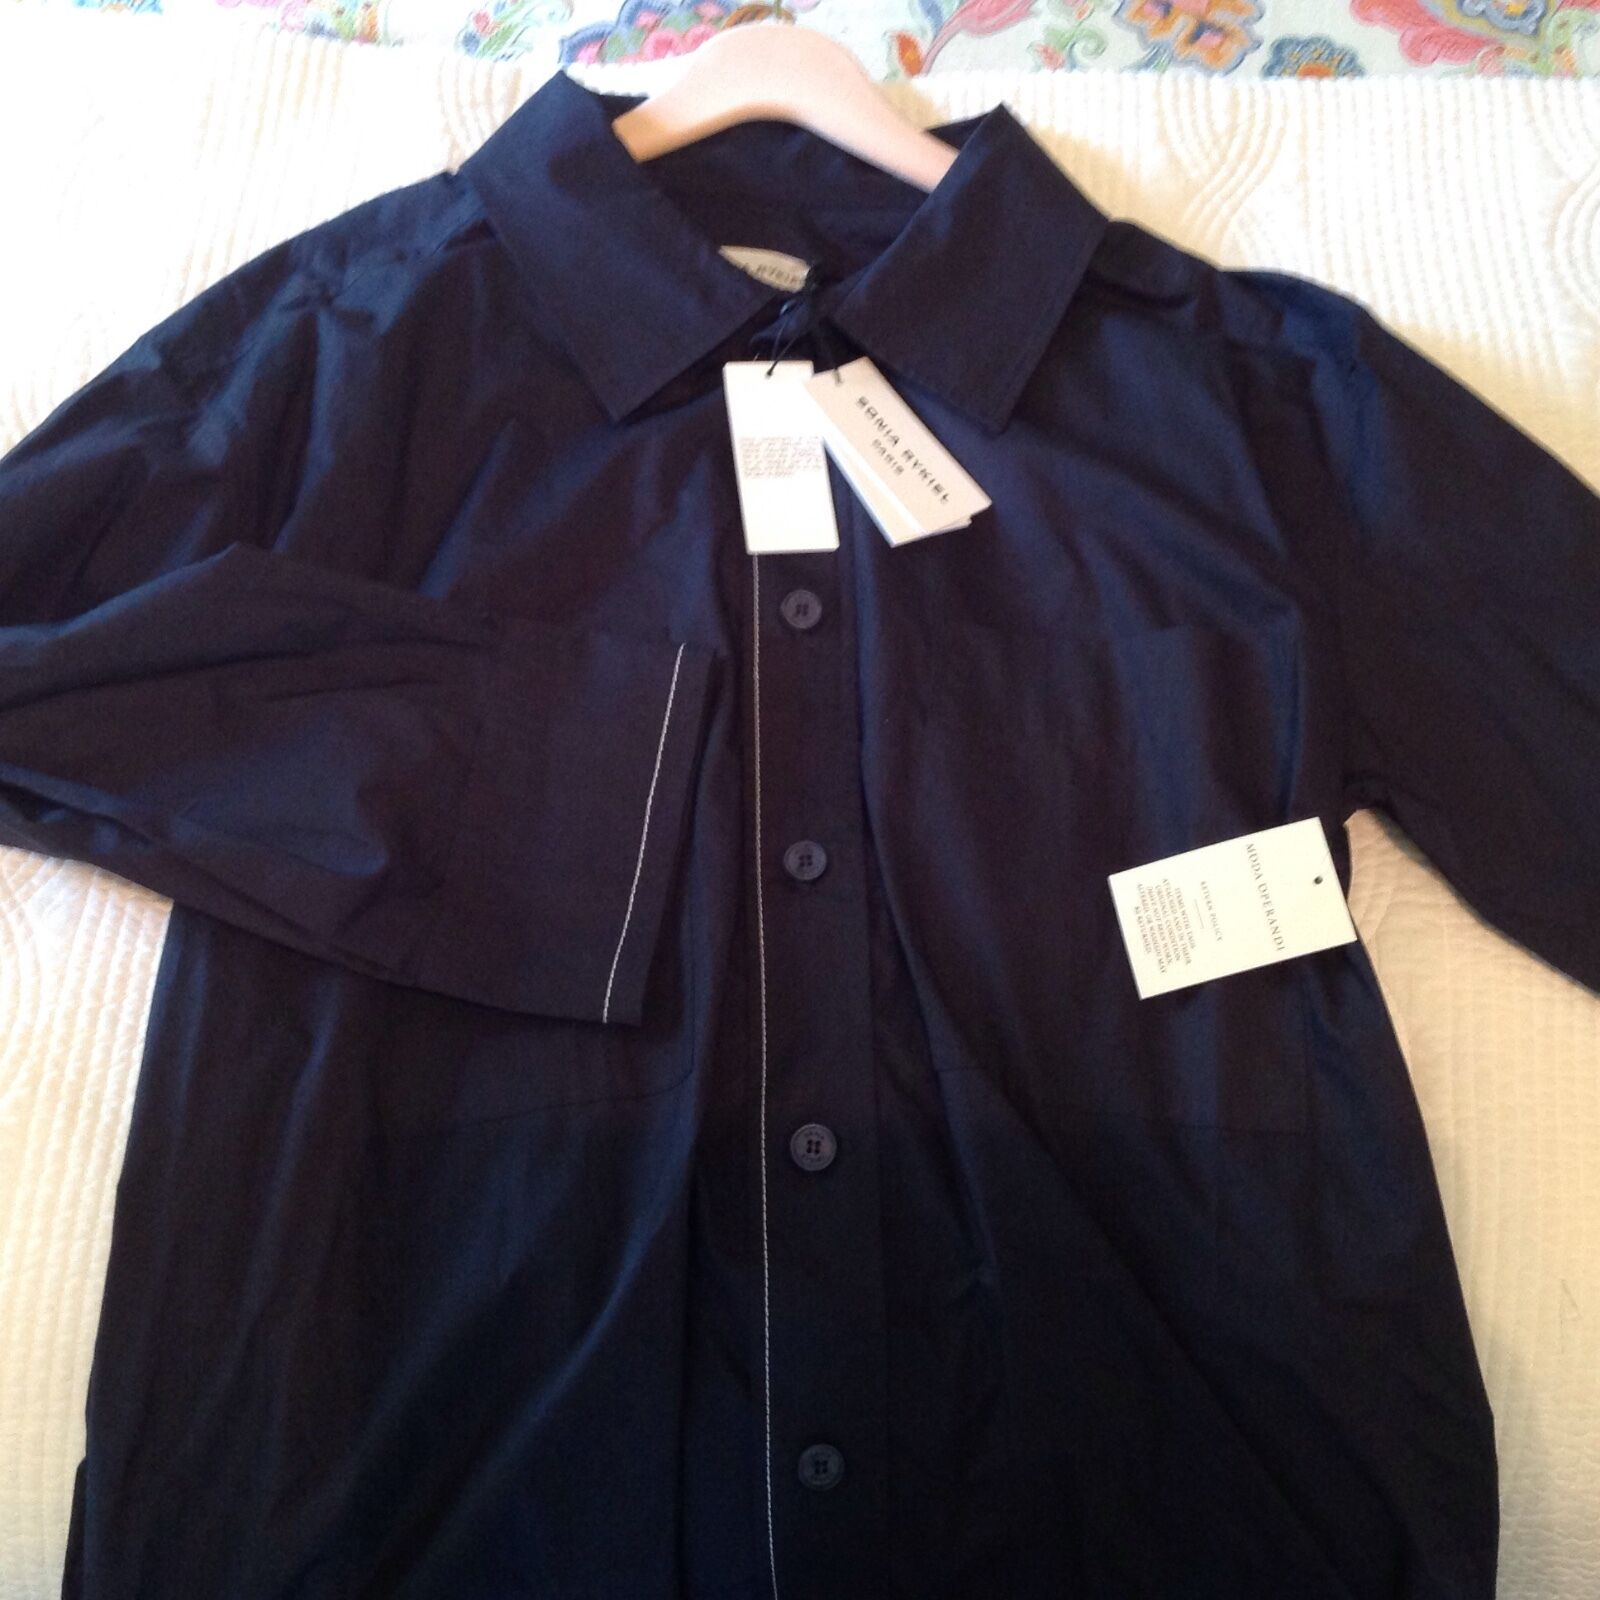 Sonia Rykiel Paris parachute parachute parachute shirt dress Navy blueee oversized 34 9f28c4